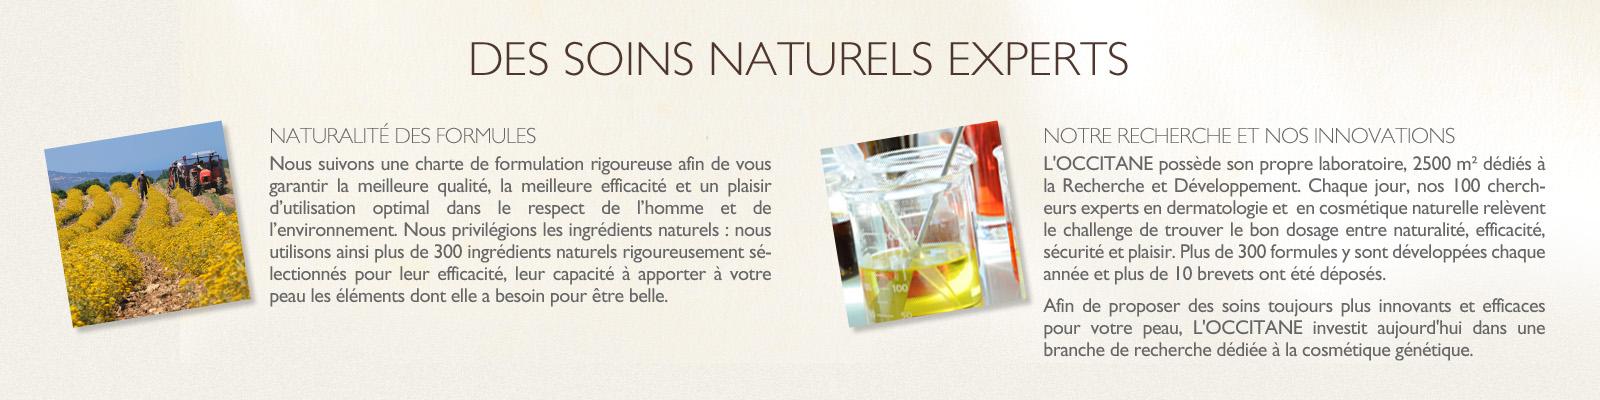 Soins experts - L'Occitane